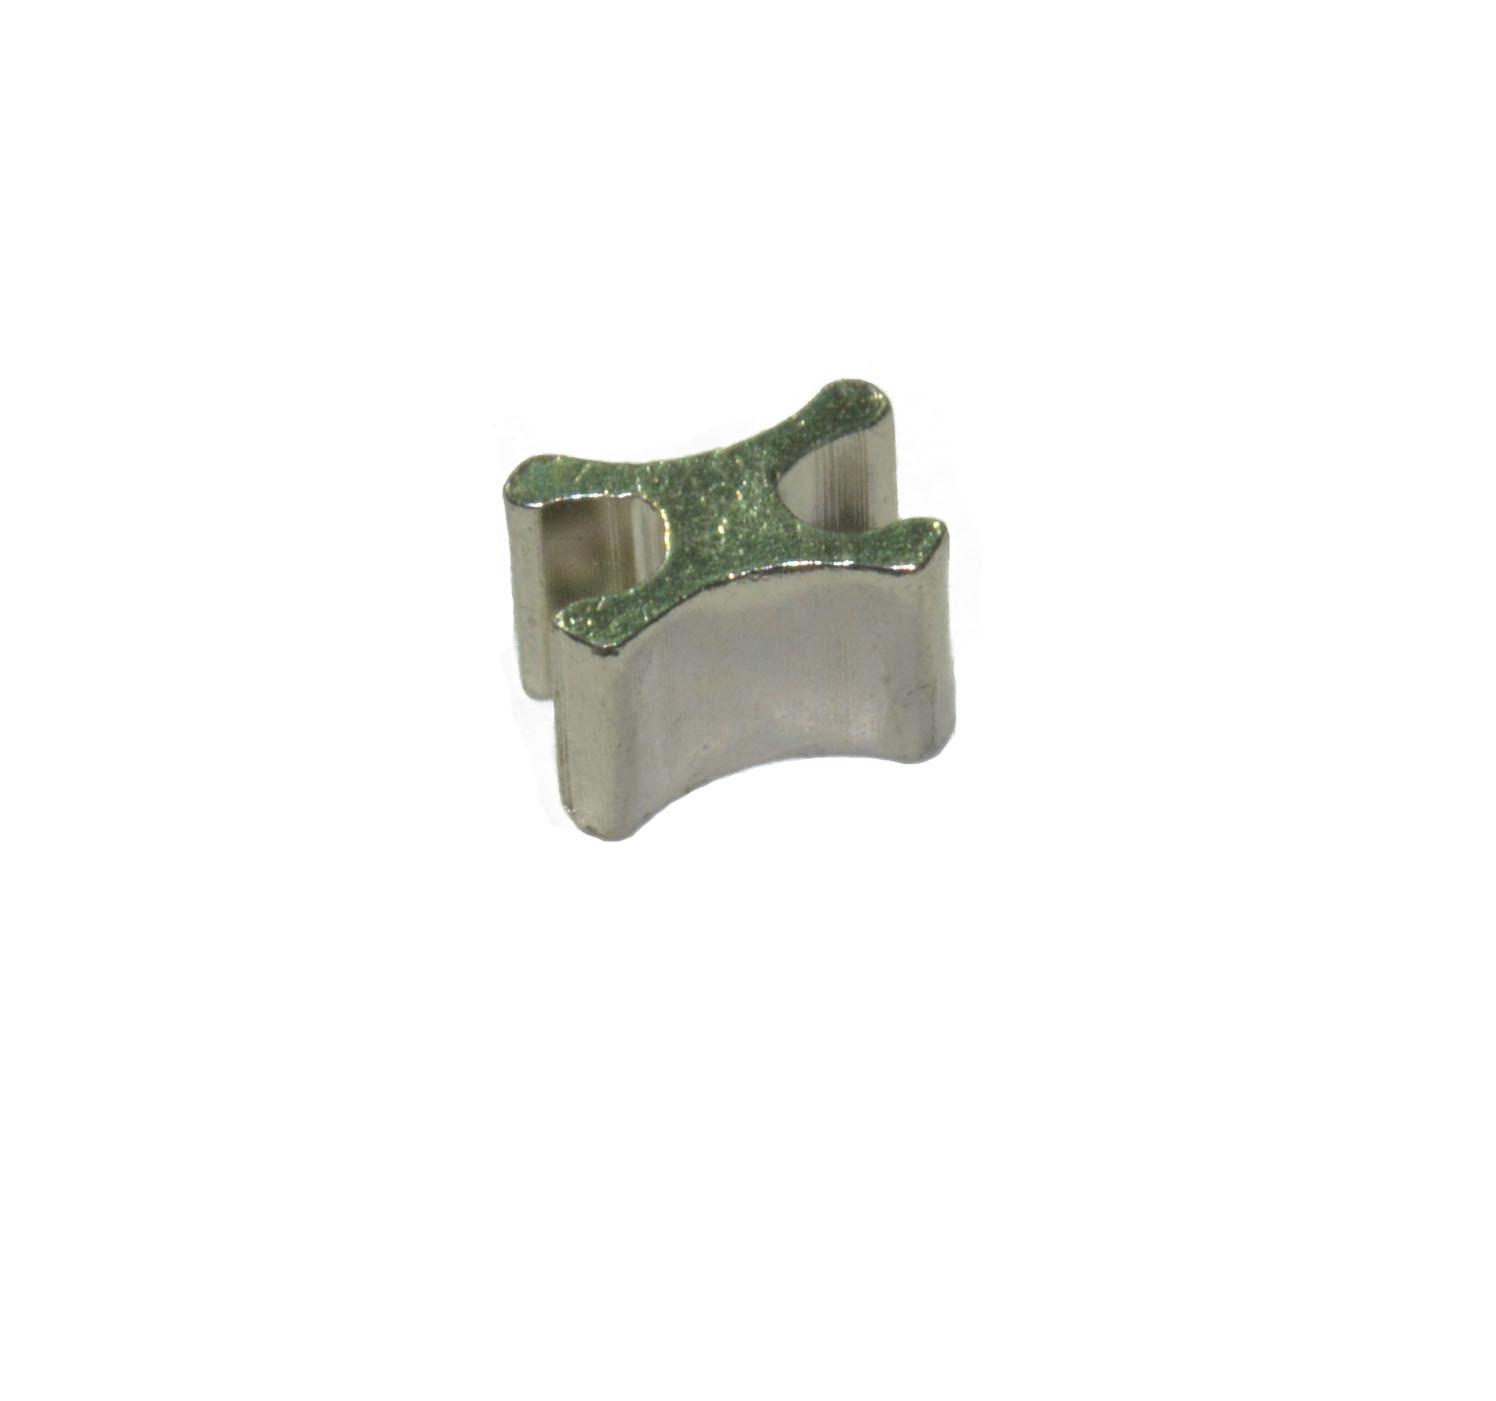 Stainless Steel Zipper Stop